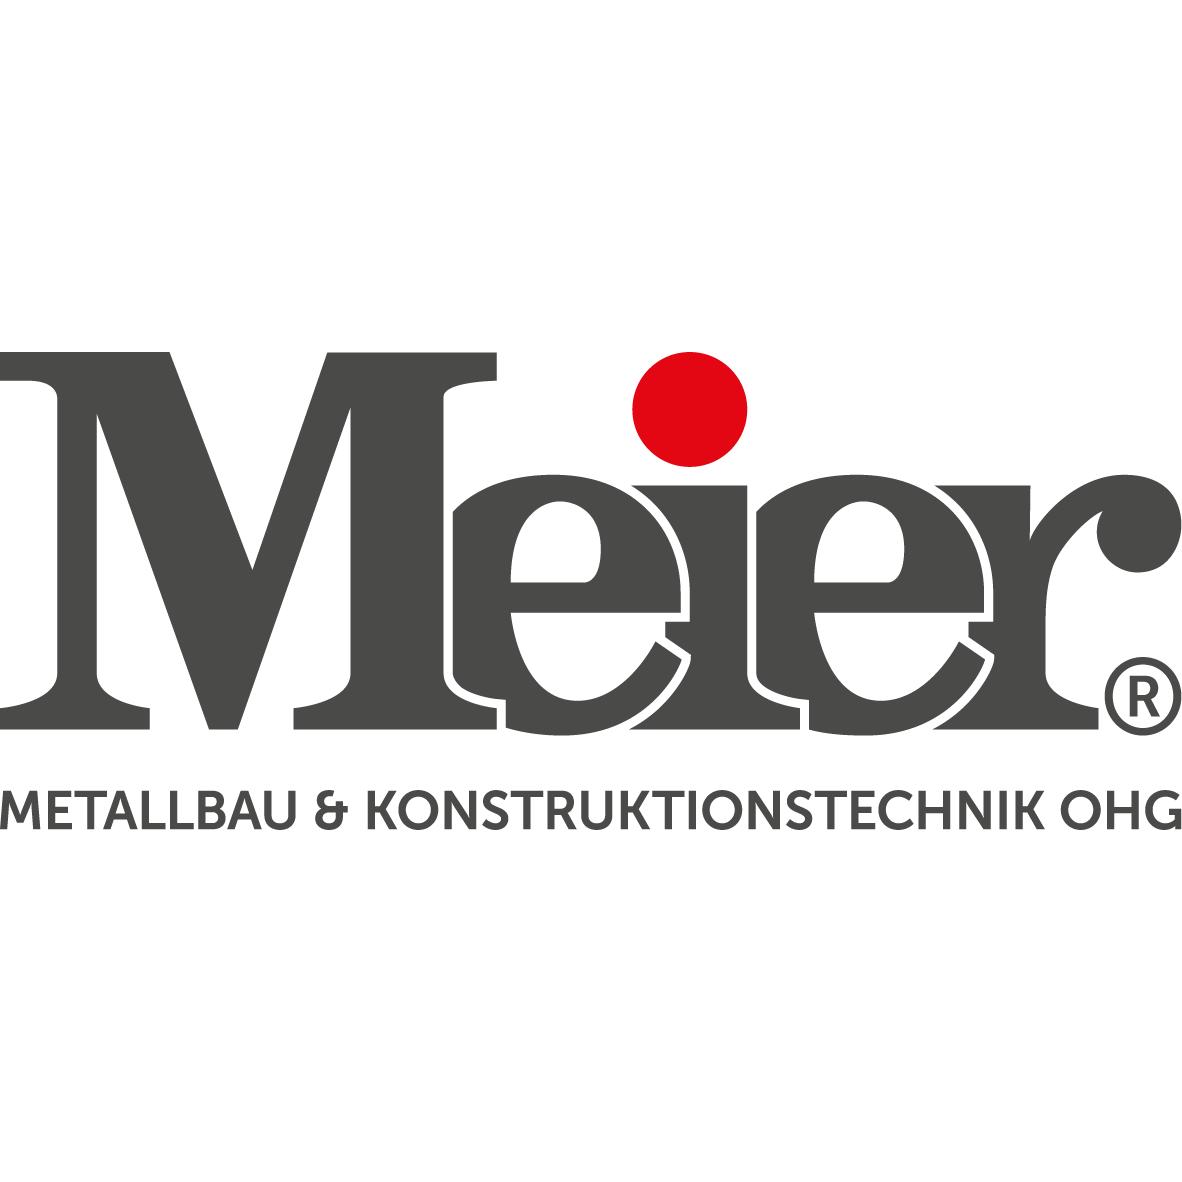 Meier Metallbau & Konstruktionstechnik OHG